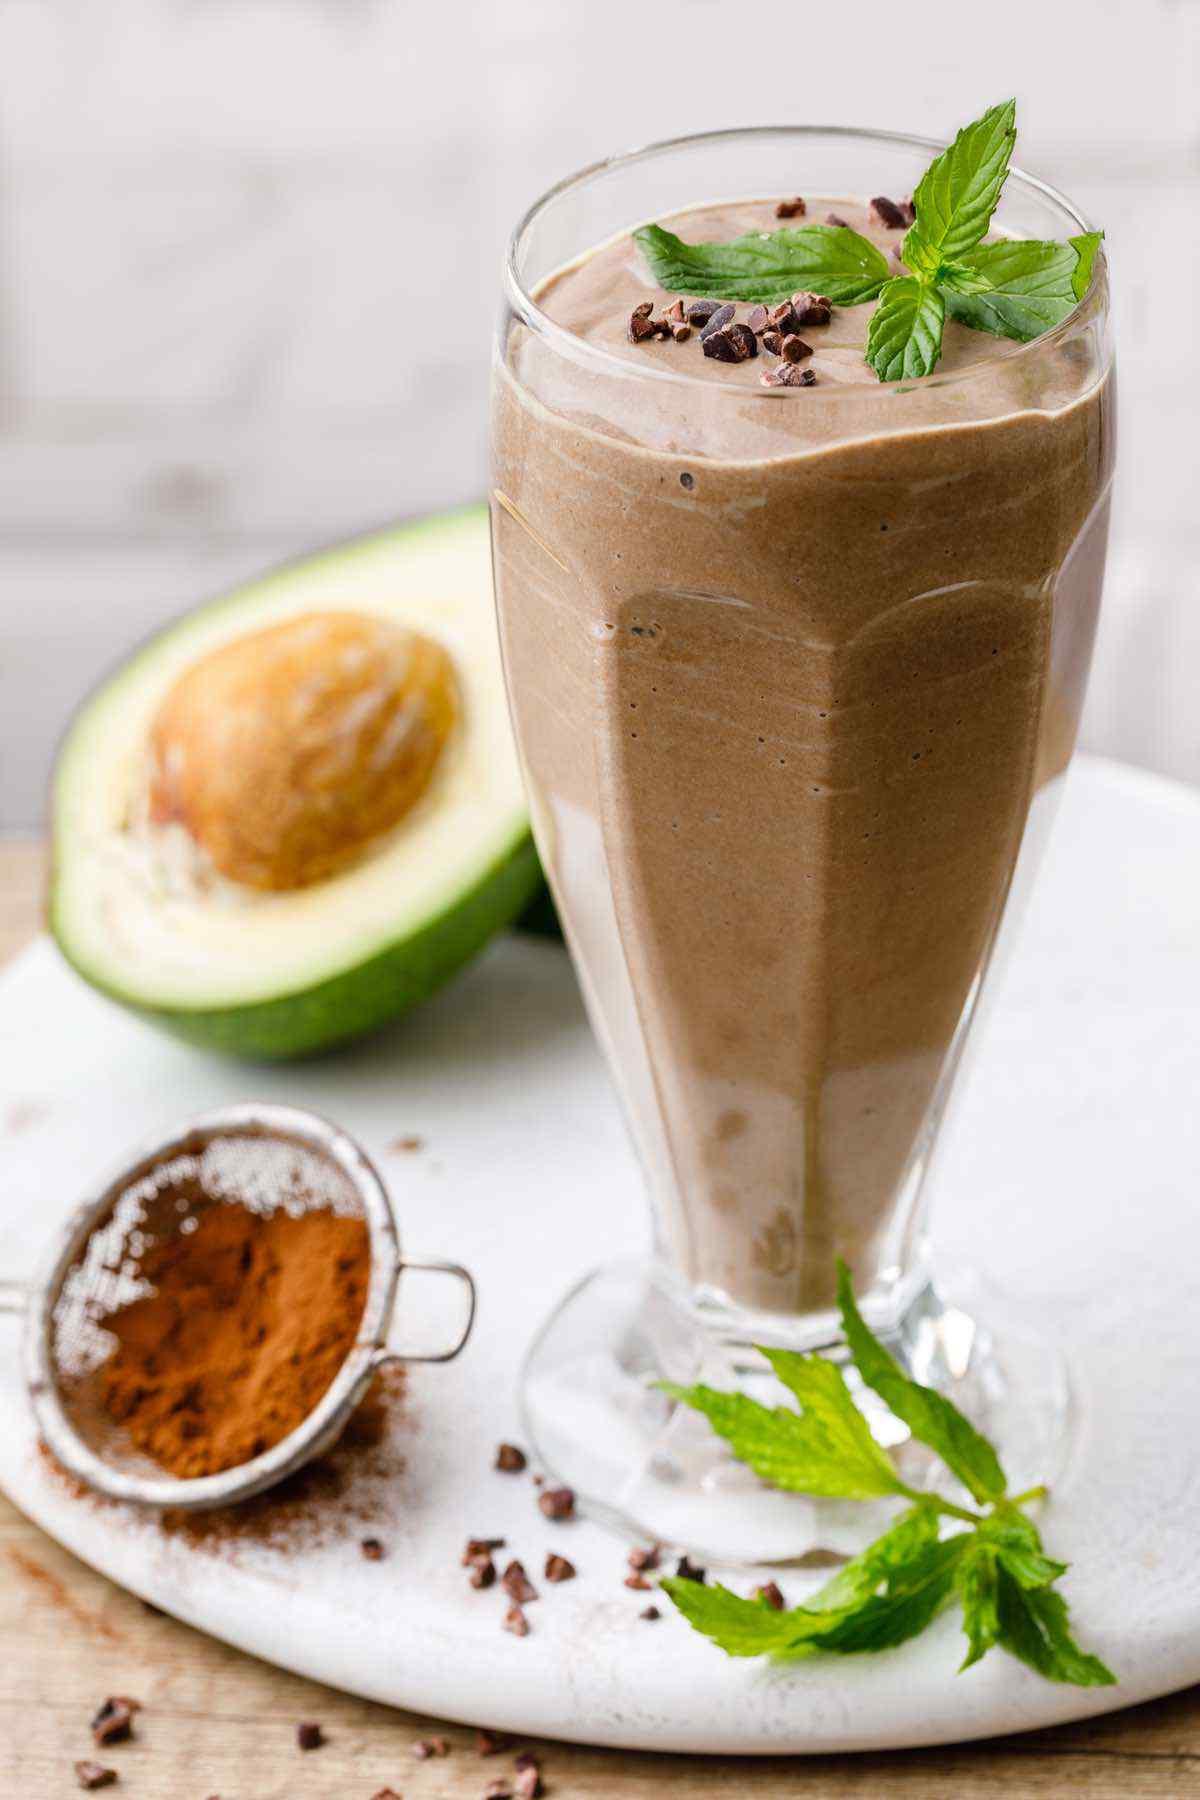 Chocolate Avocado Paleo Smoothie